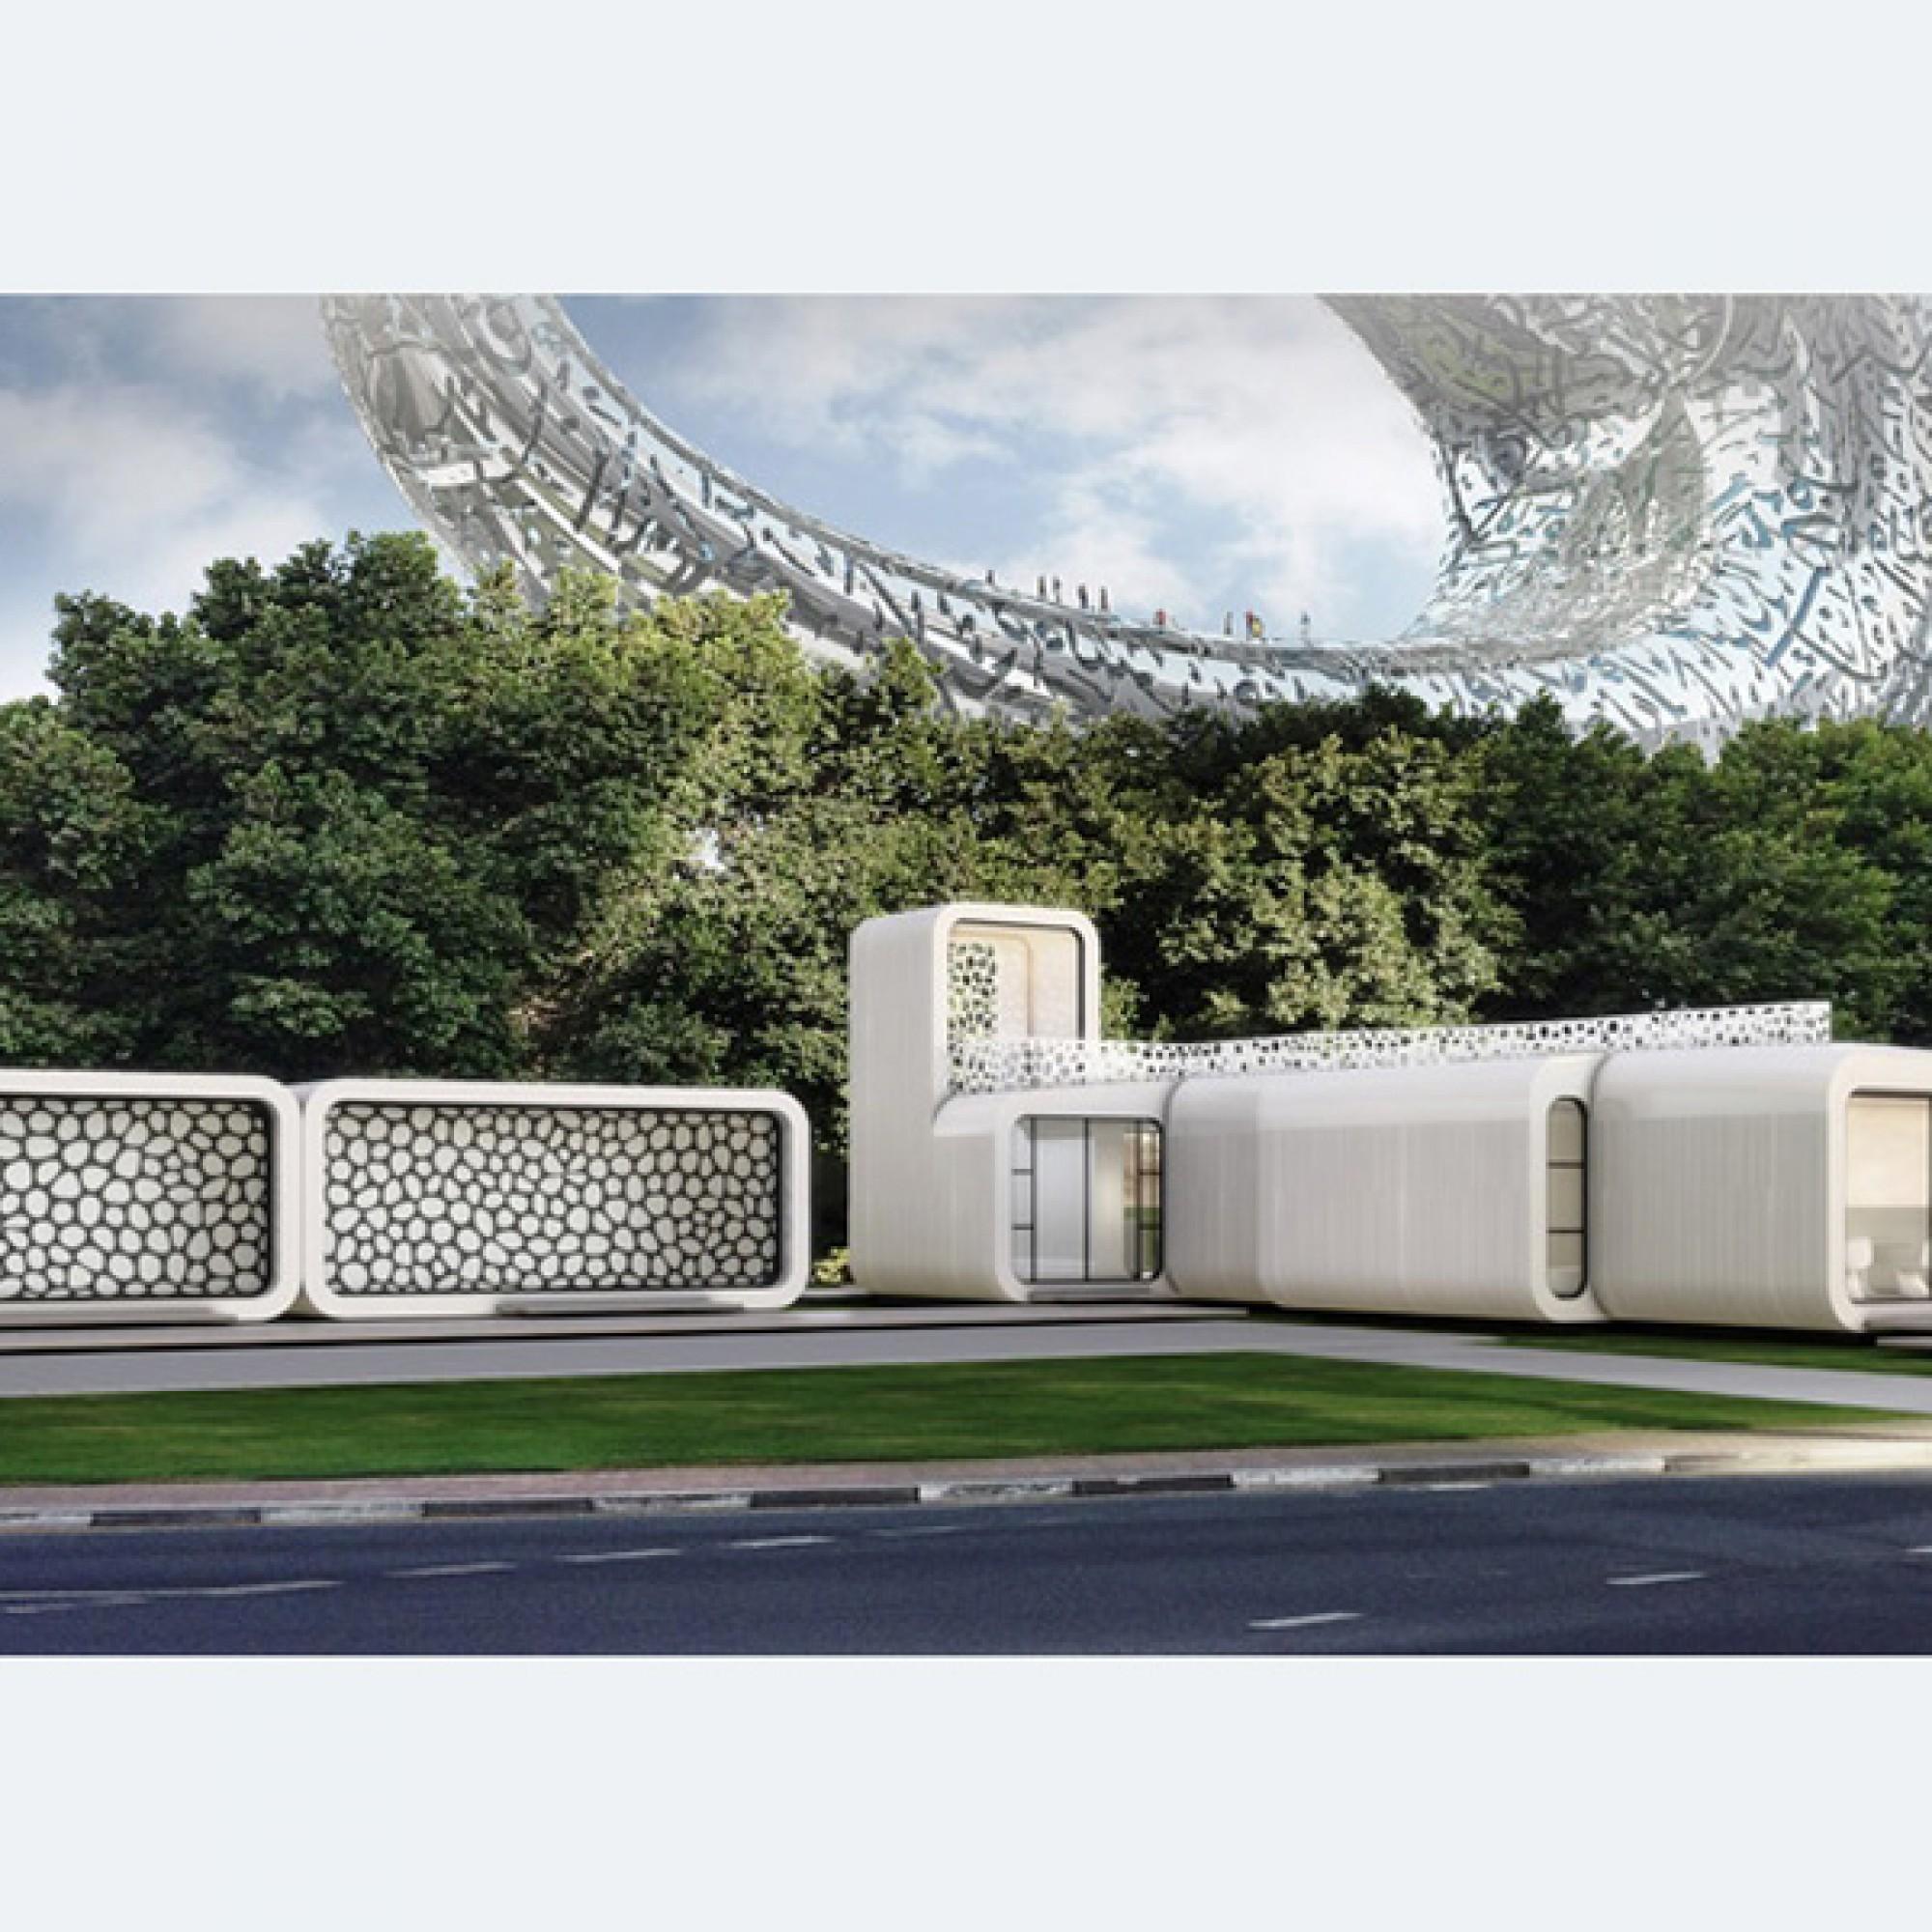 Das geplante Büro in Dubai (Bilder: zvg)